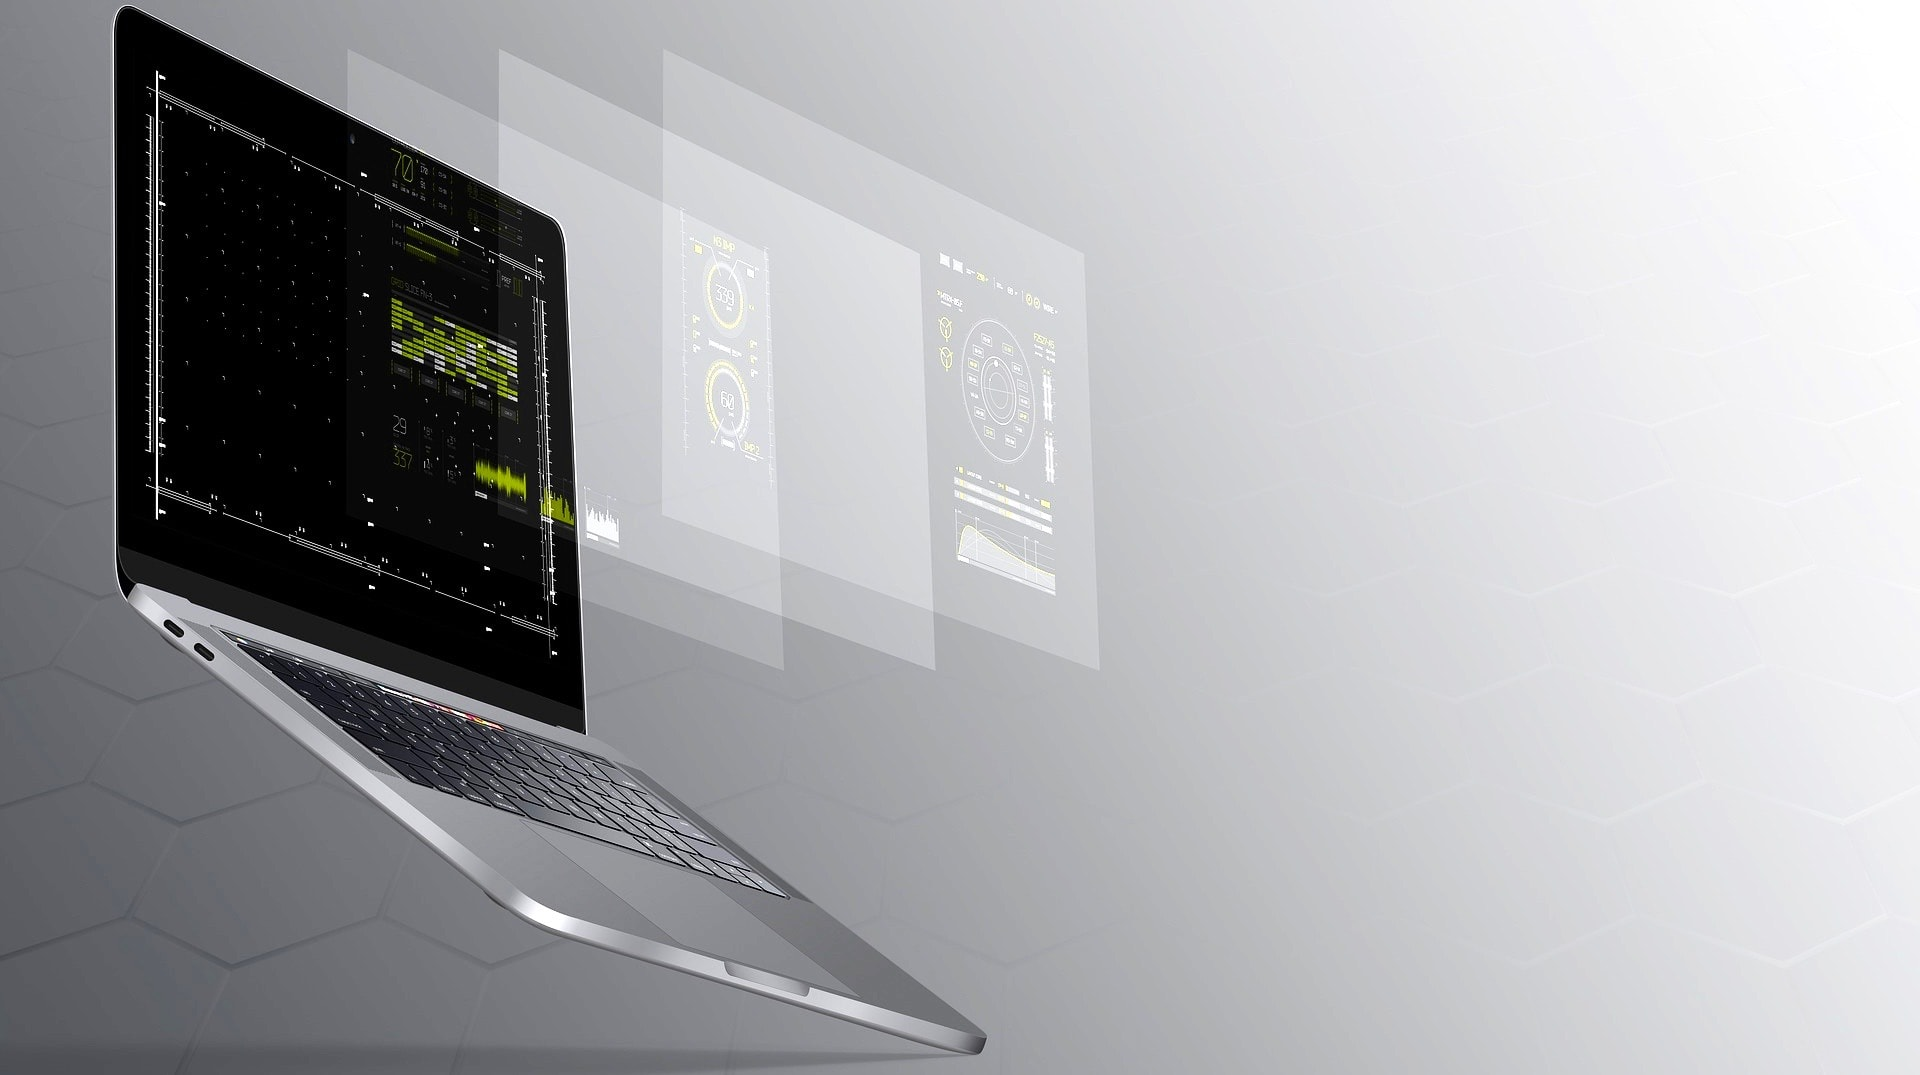 laptop-3174729_1920-1